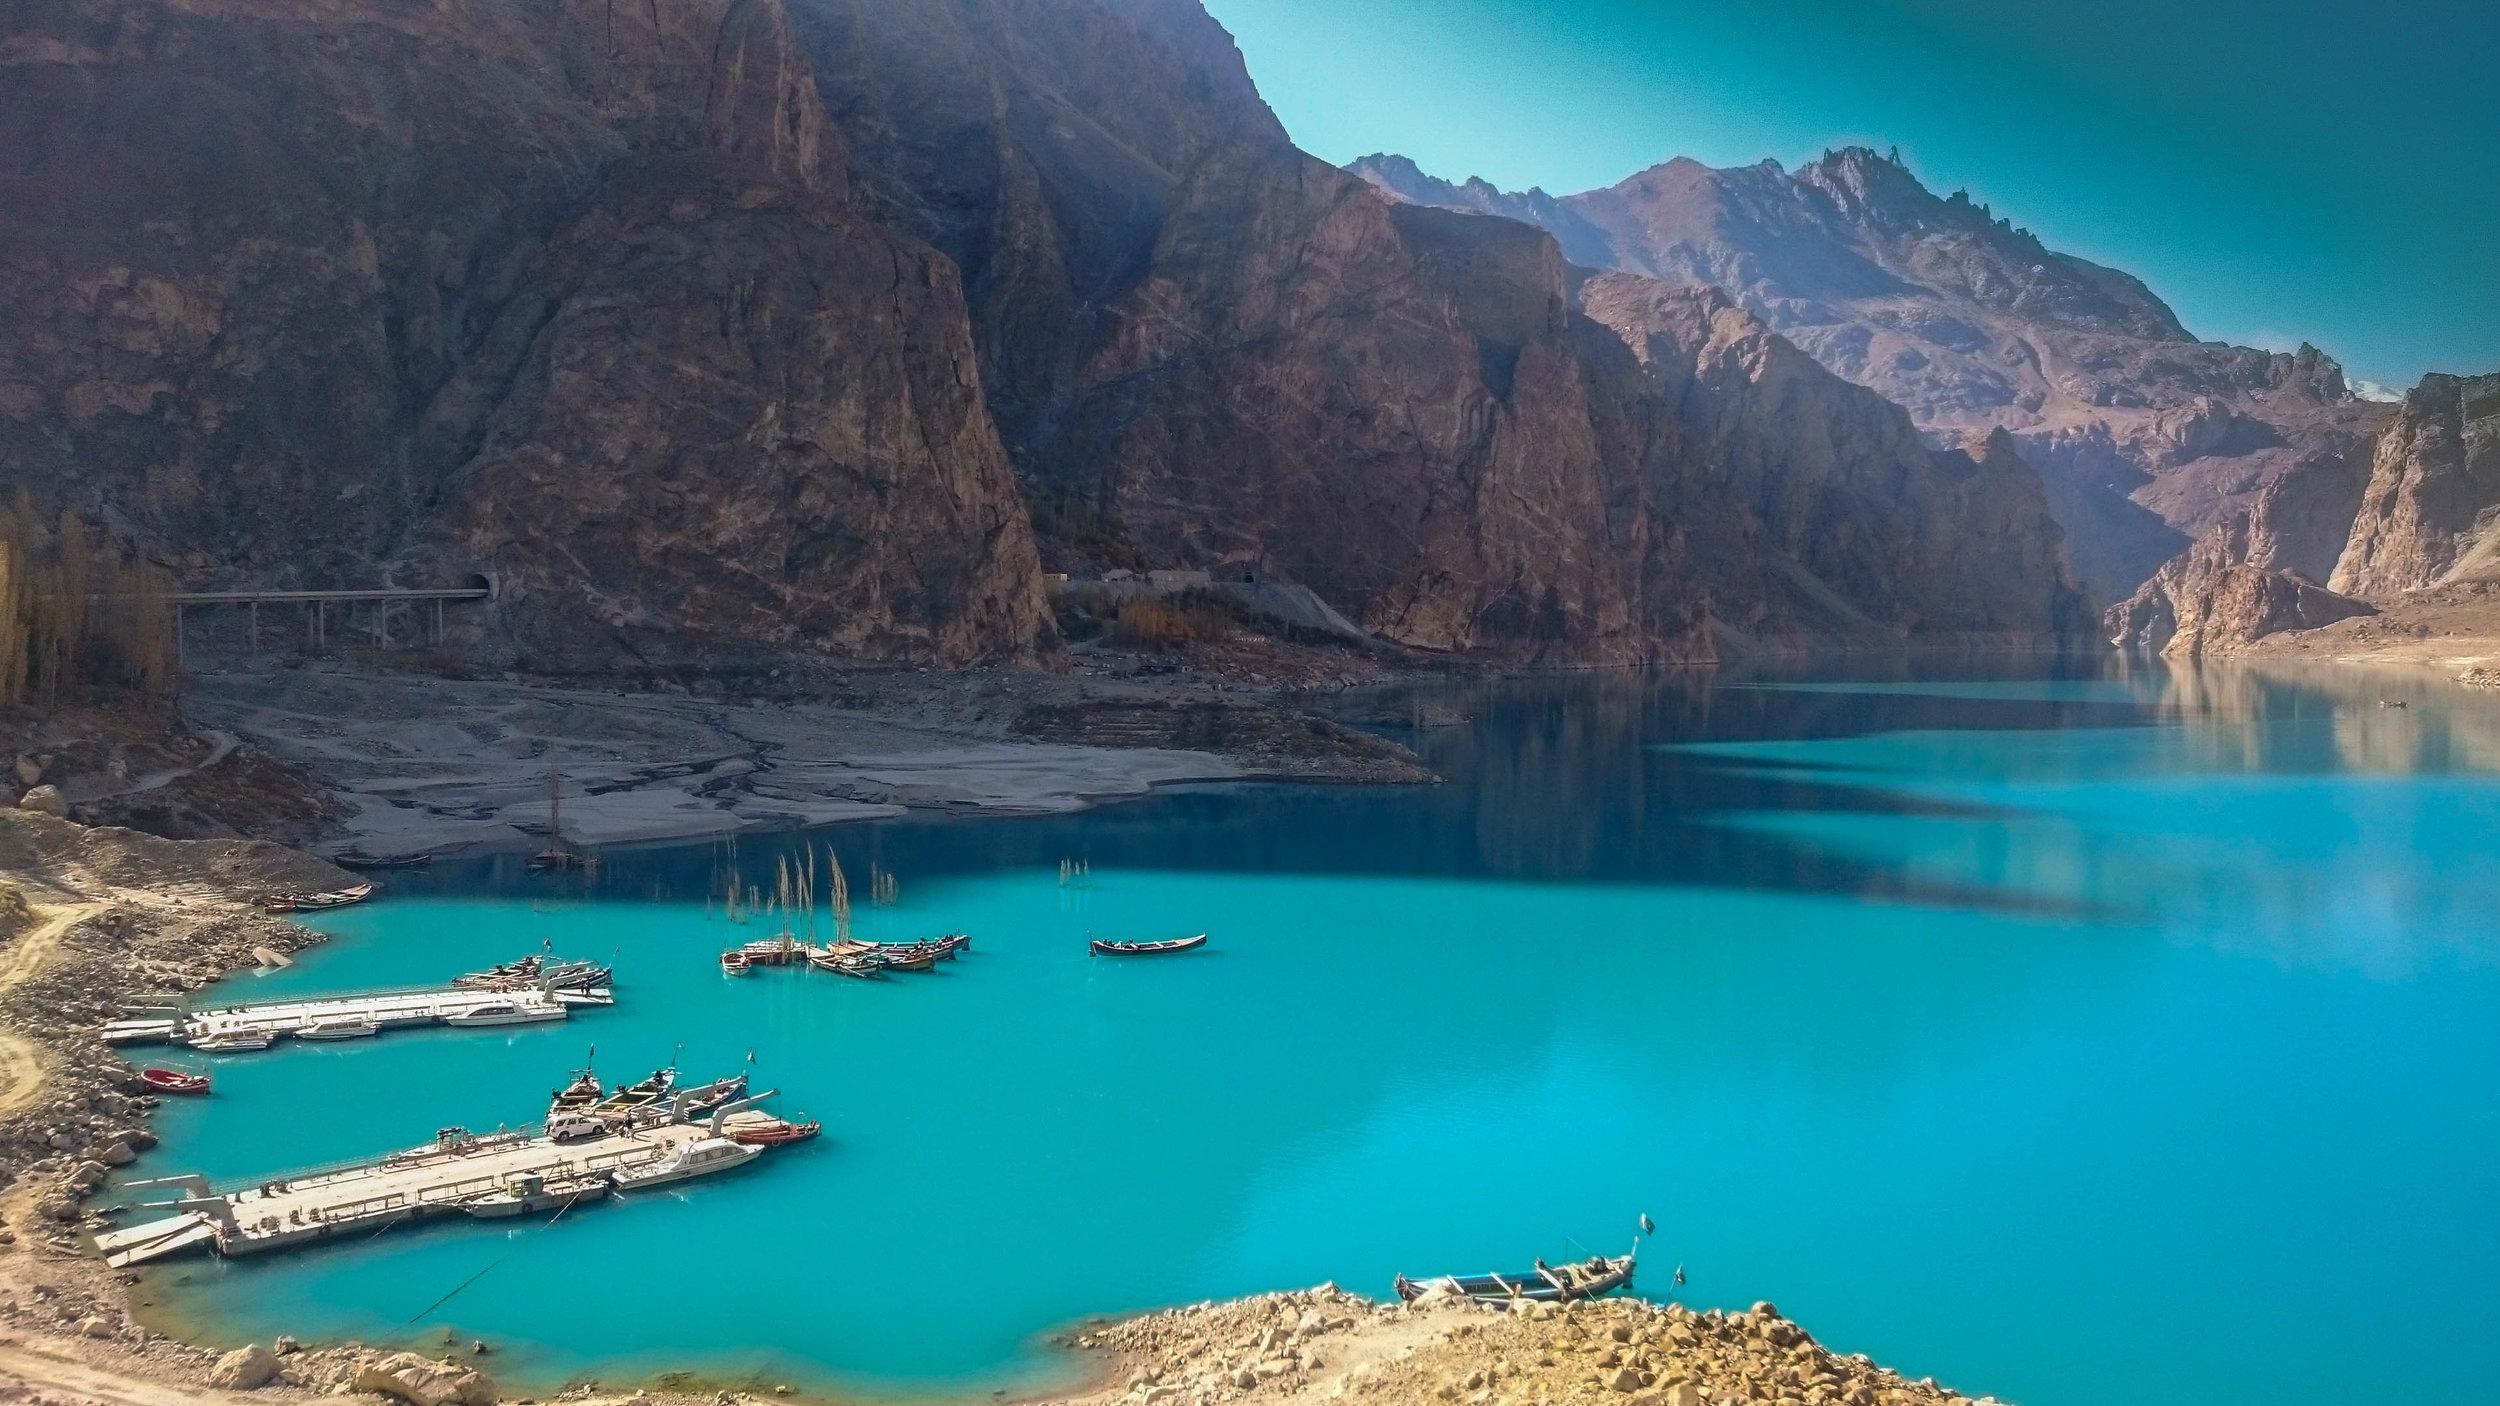 The Attabad Lake.